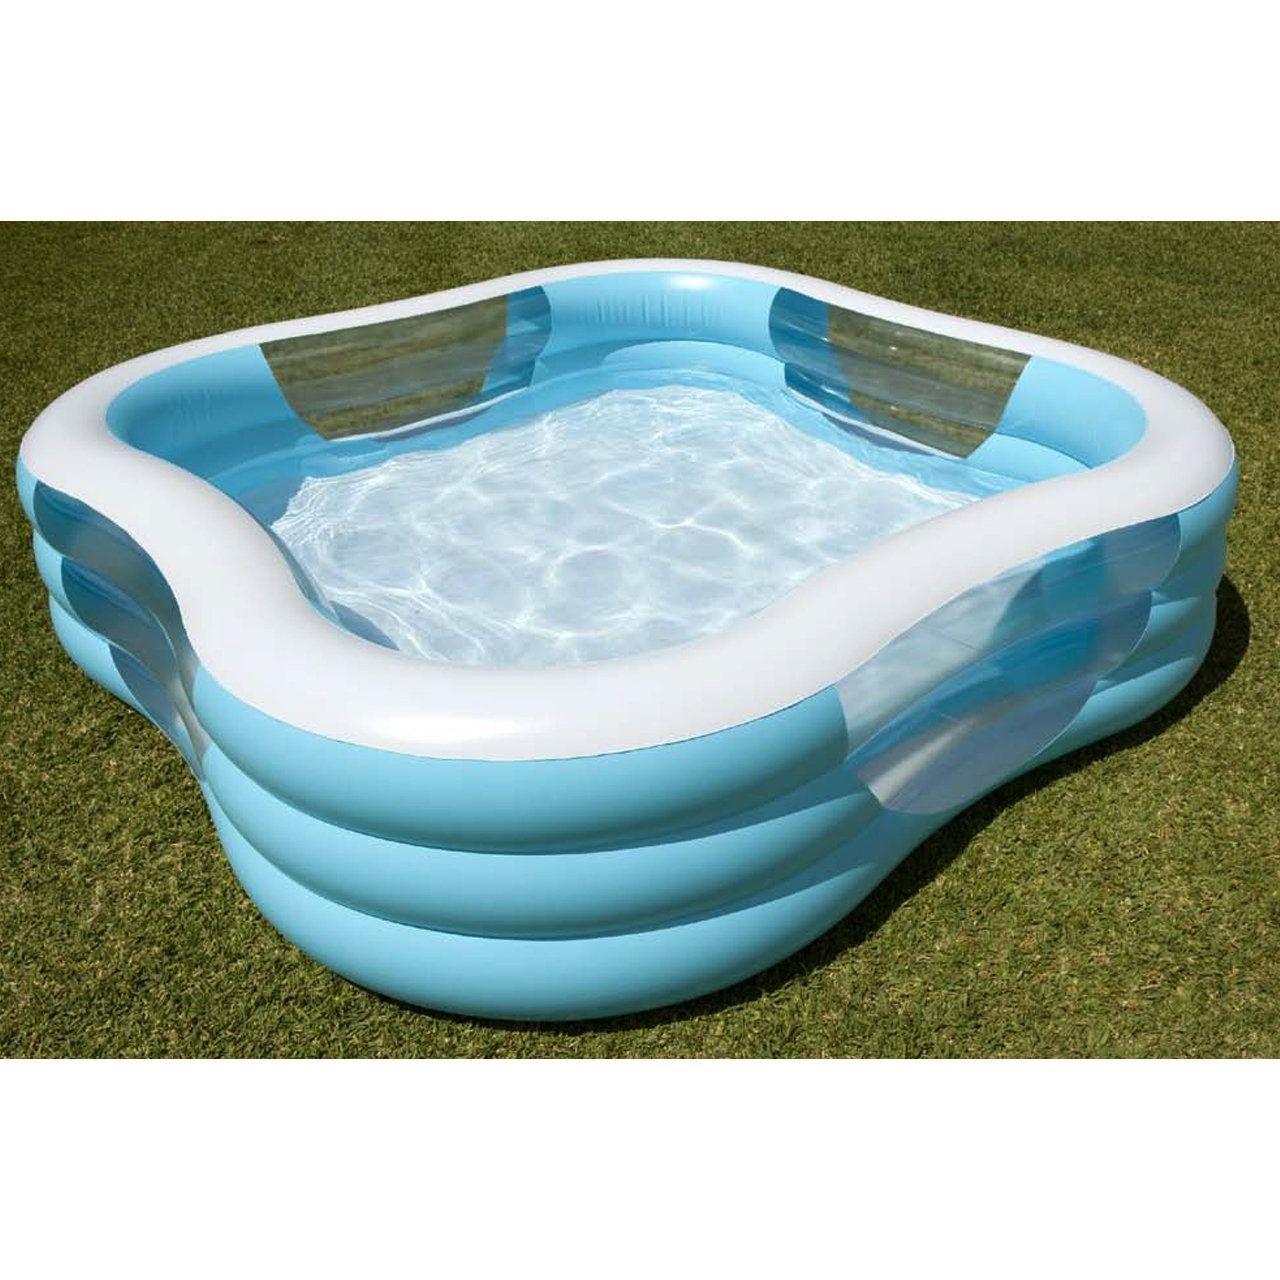 Swim Center Family Pool (90inches), Blue, Intex(Plastic